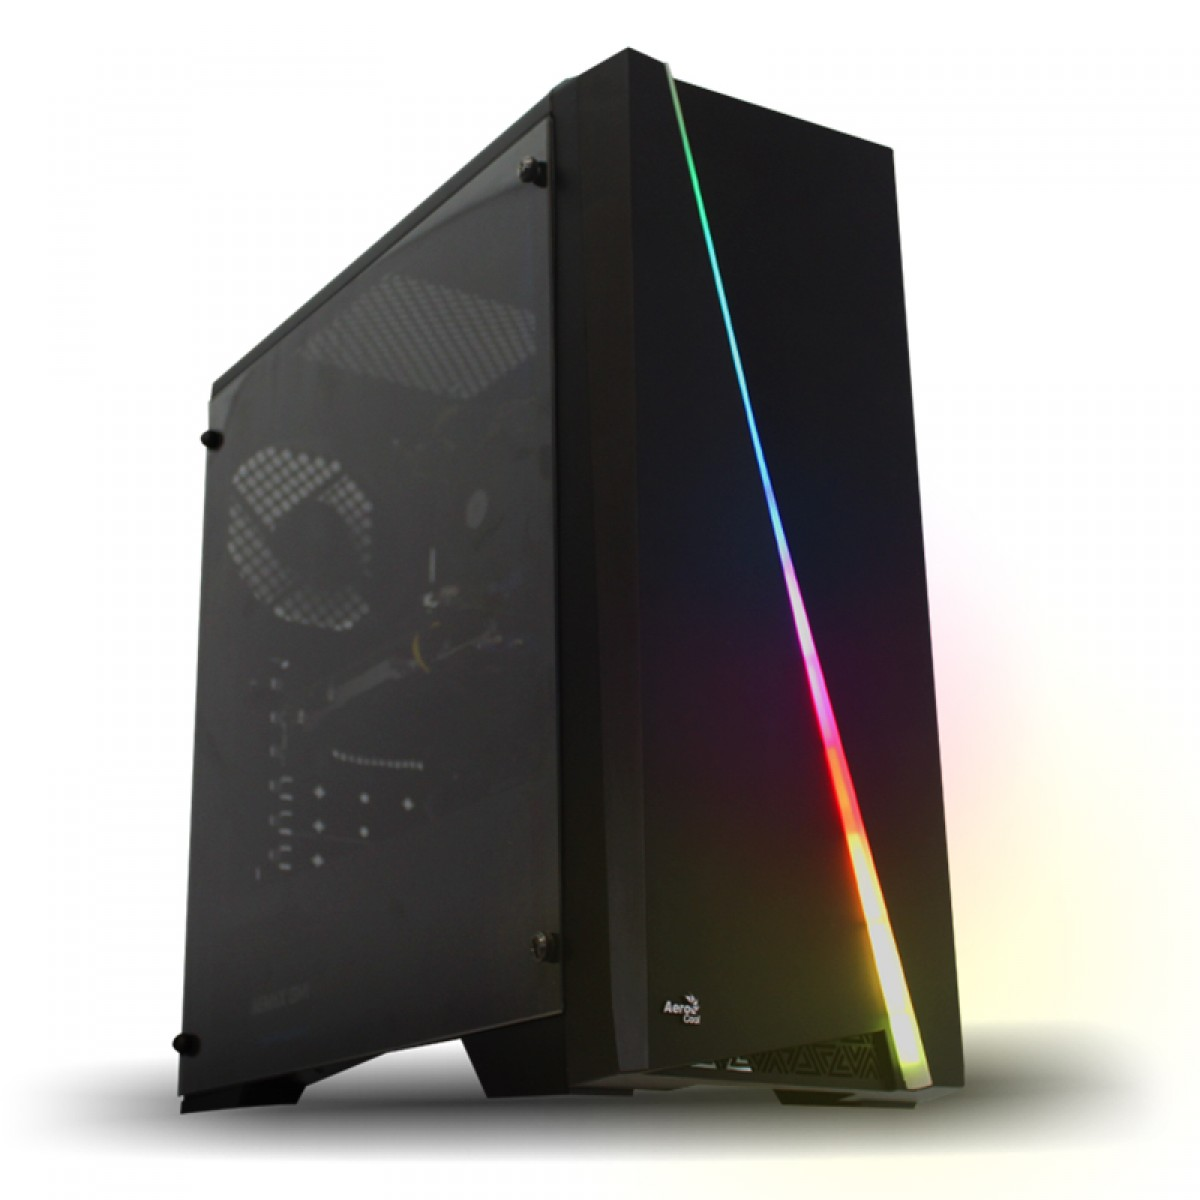 Pc Gamer T-Power Super Warlord Lvl-5 AMD Ryzen 7 3700X / Geforce RTX 2080 8GB / DDR4 16GB / HD 1TB / 750W